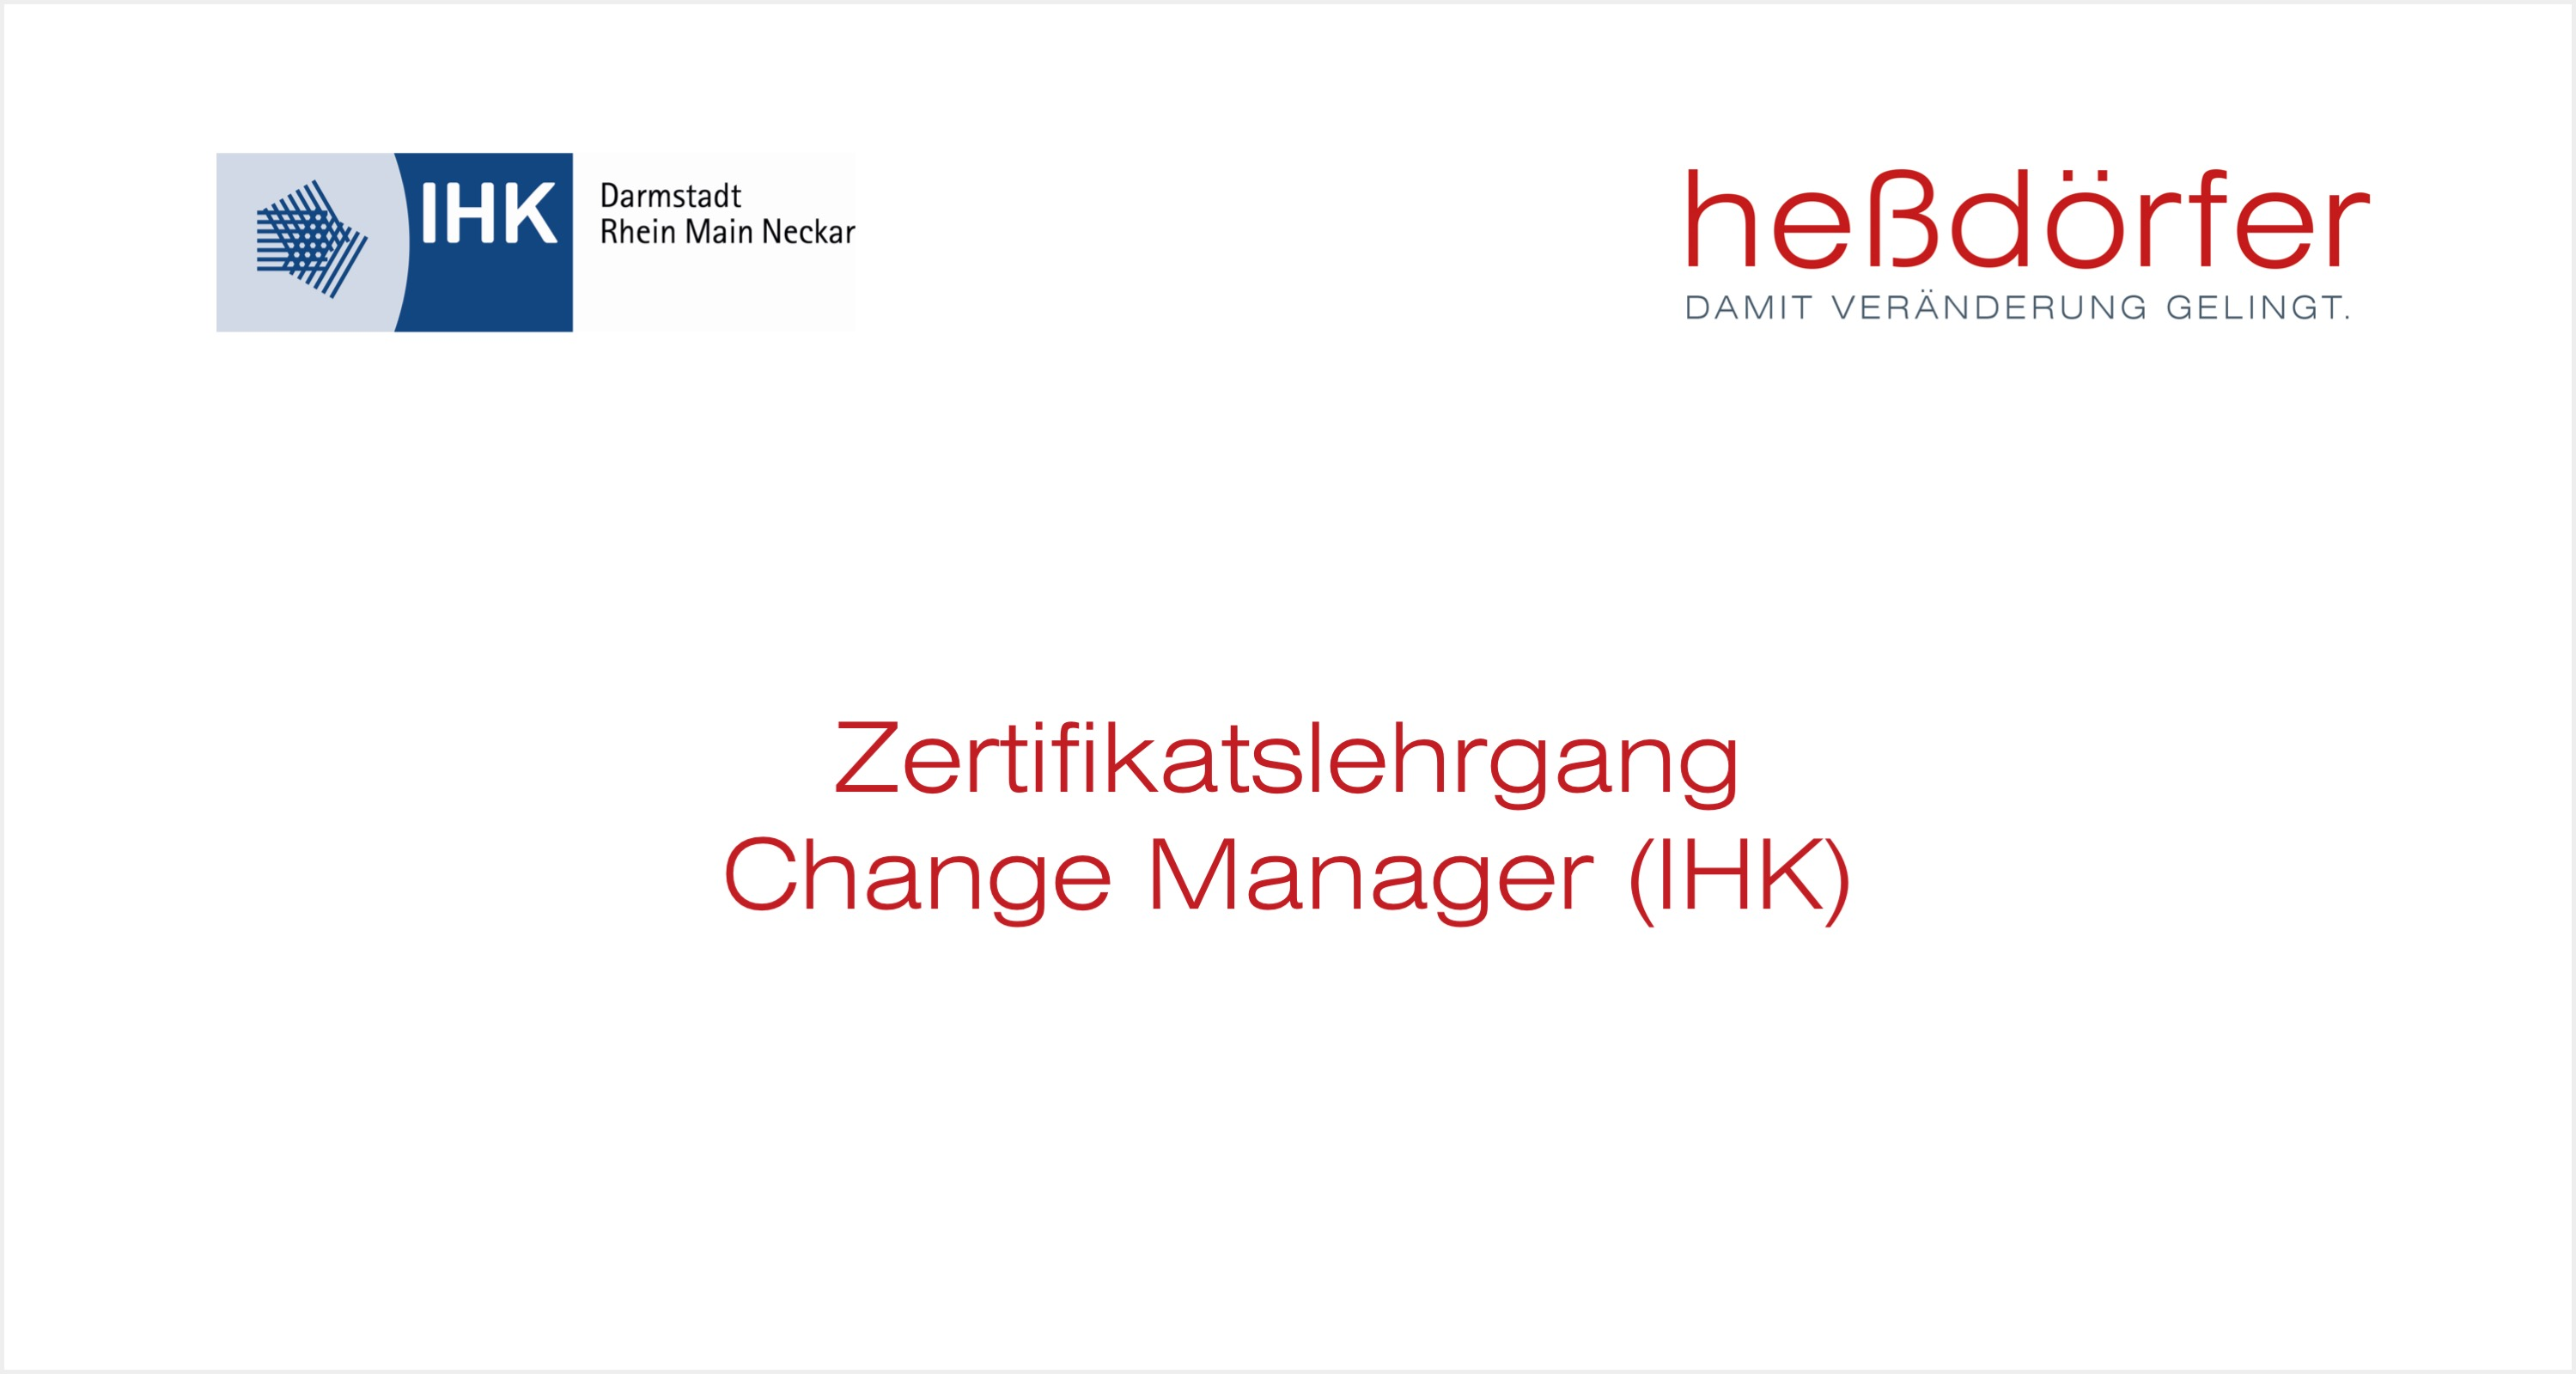 Zertifikatslehrgang - Change Manager IHK